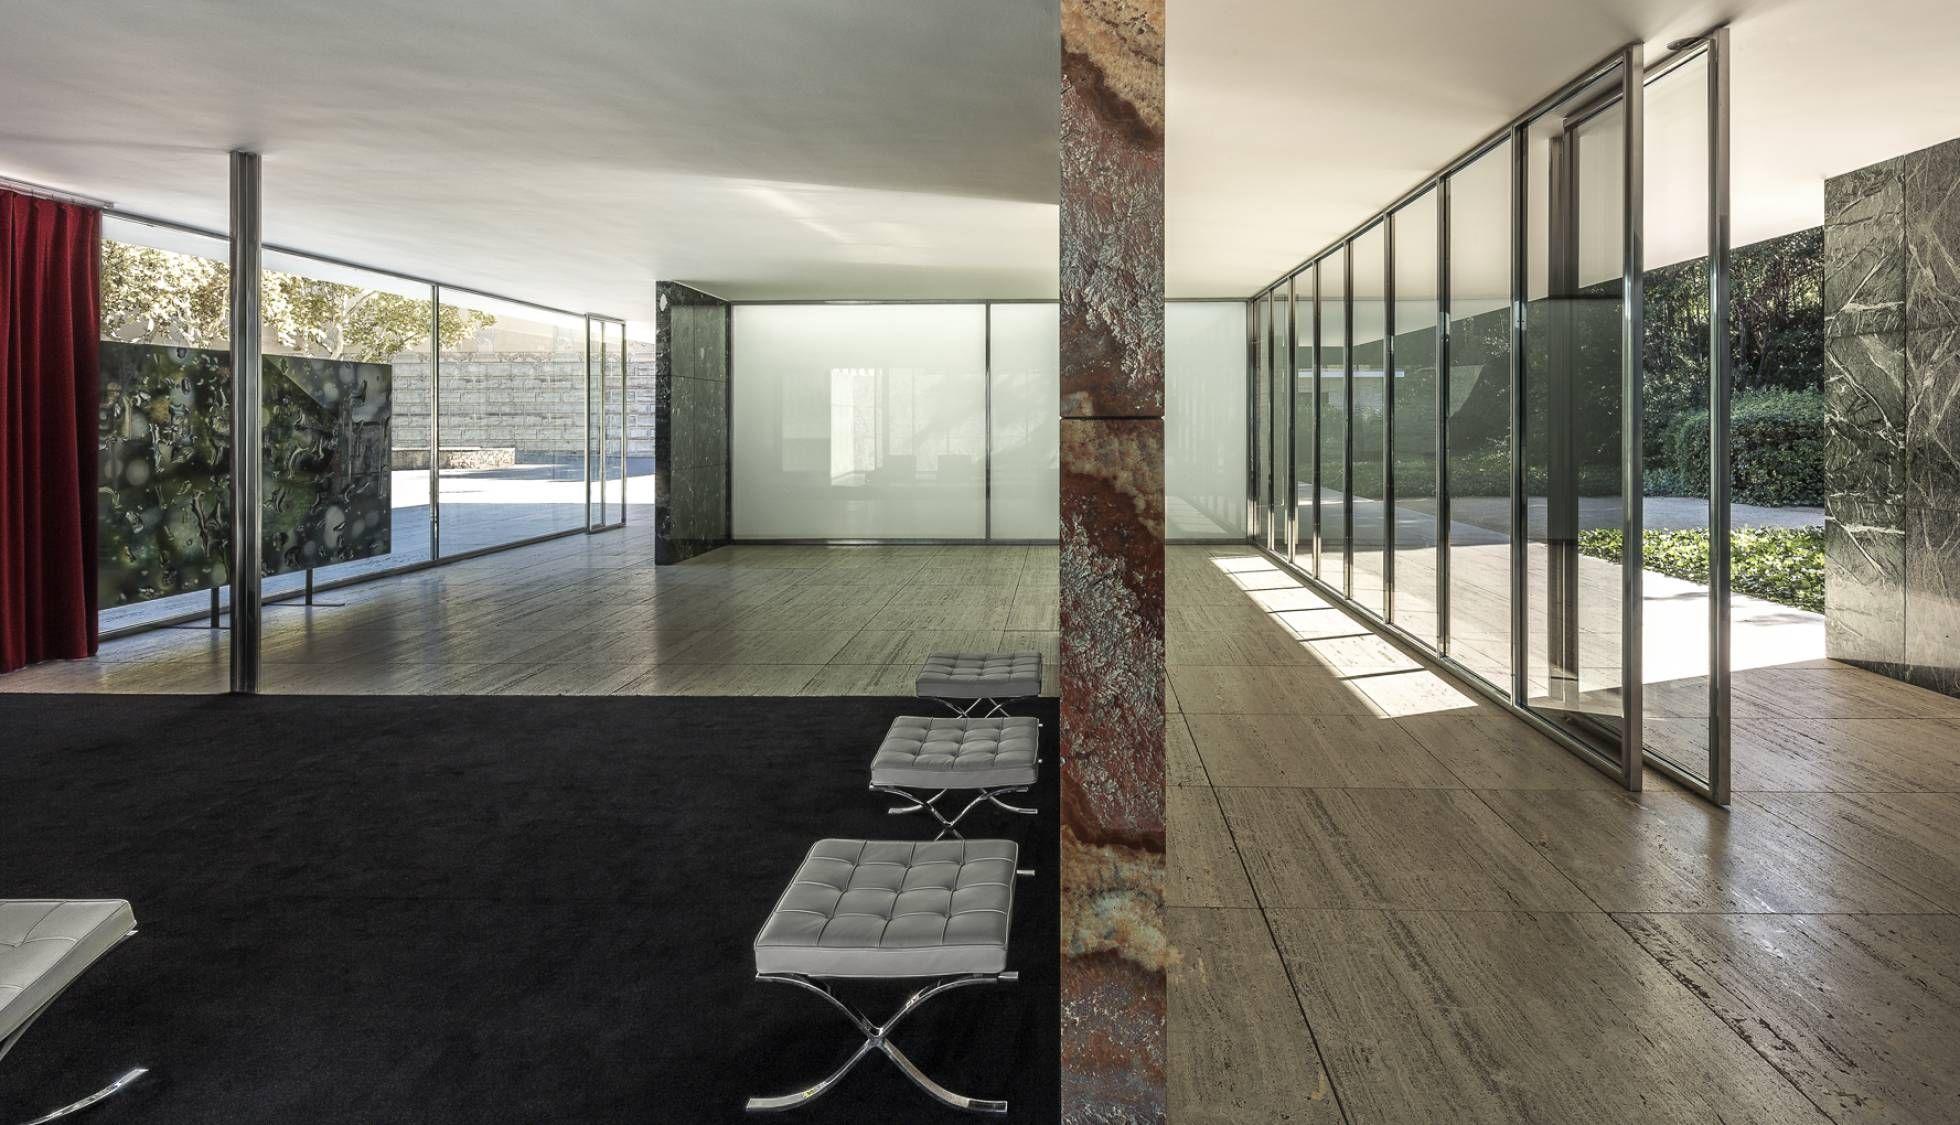 Mies van der d nde noticias pabell n arquitectura y for Casa minimalista barcelona capital